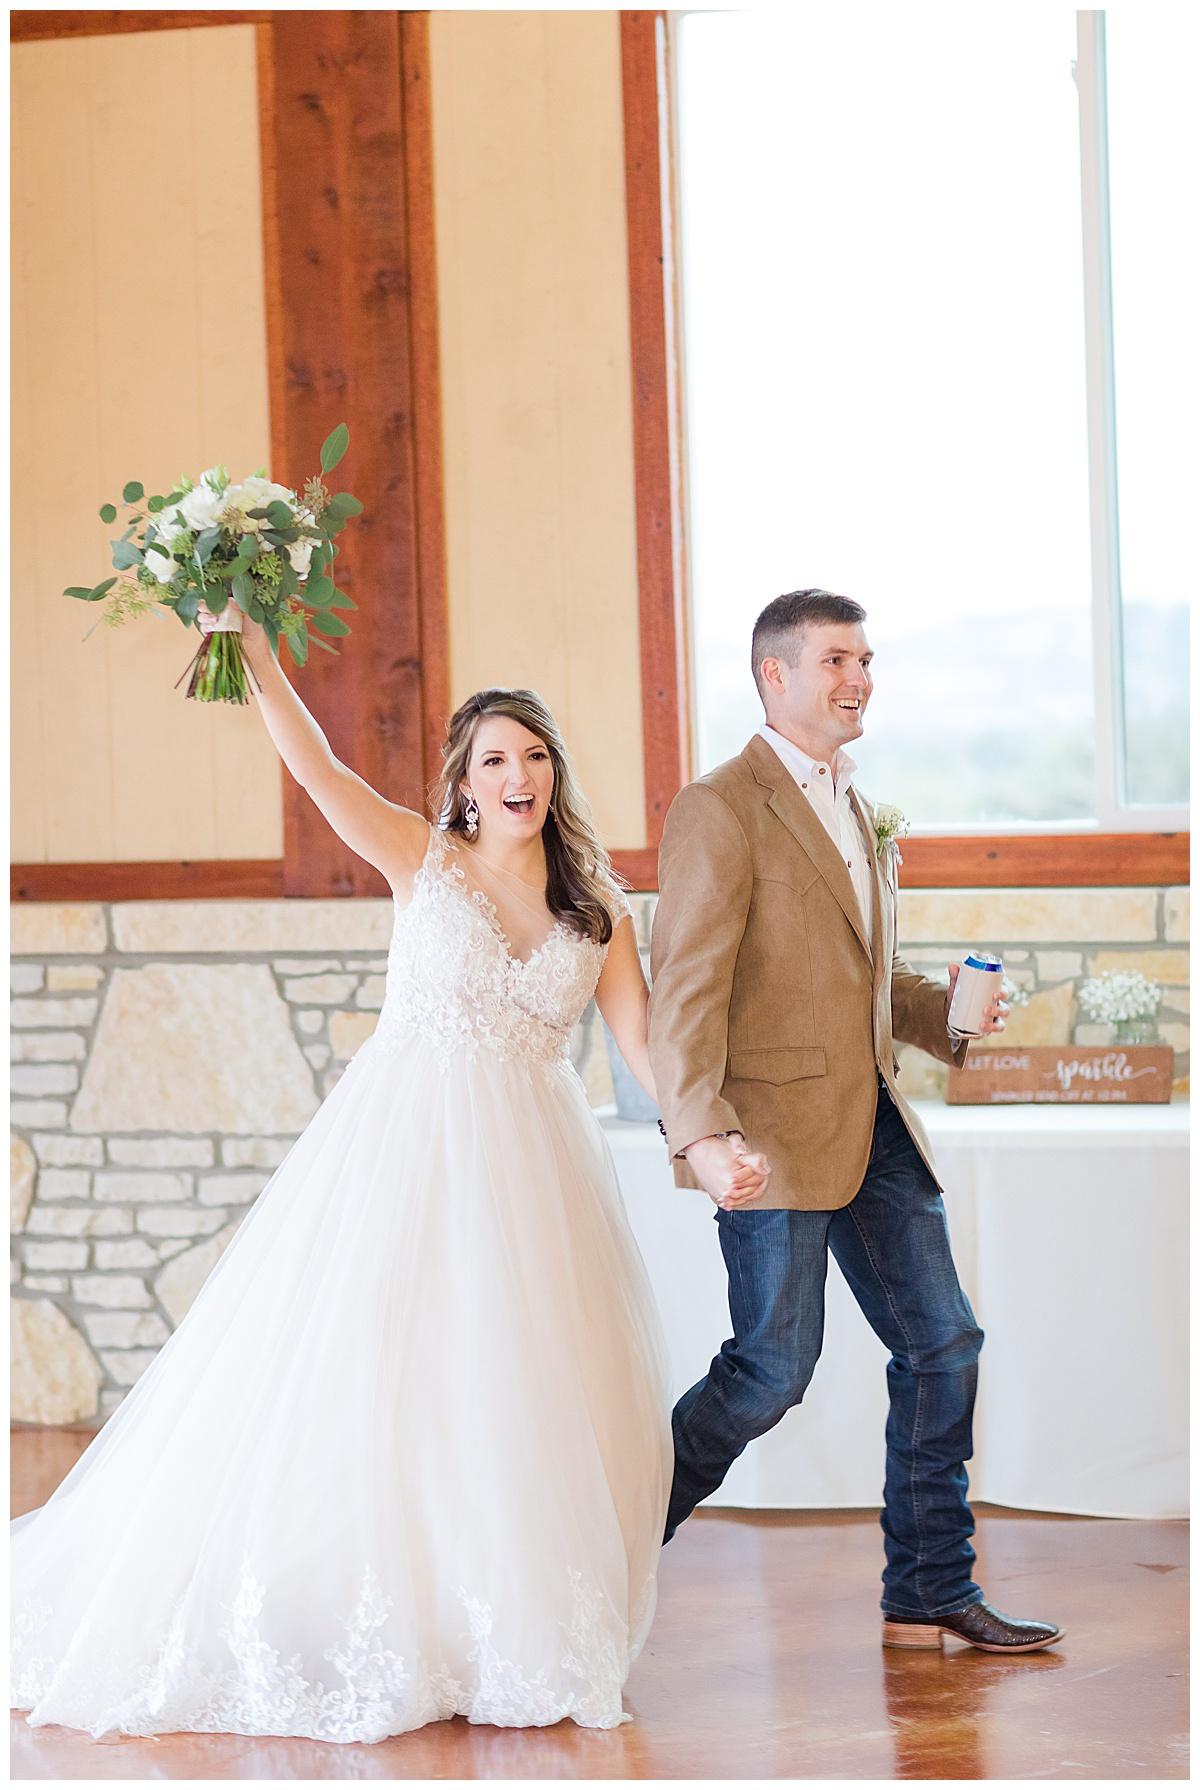 Wedding-Photographer-Texas-Hill-Country-Happy-H-Ranch-Comfor-Texas-Carly-Barton-Photography_0066.jpg